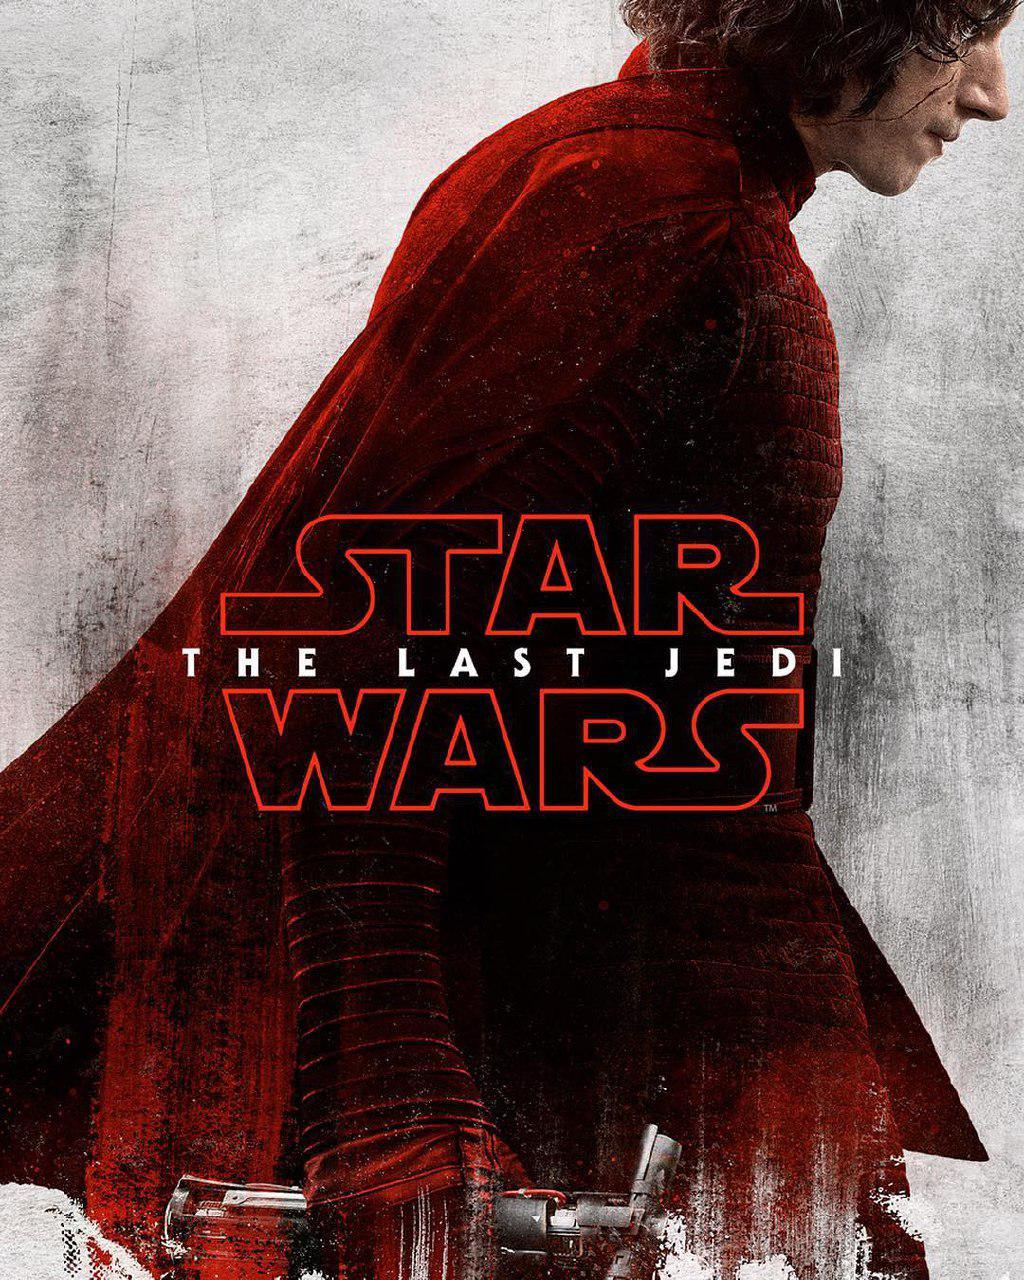 Star Wars Os Últimos Jedi (13)